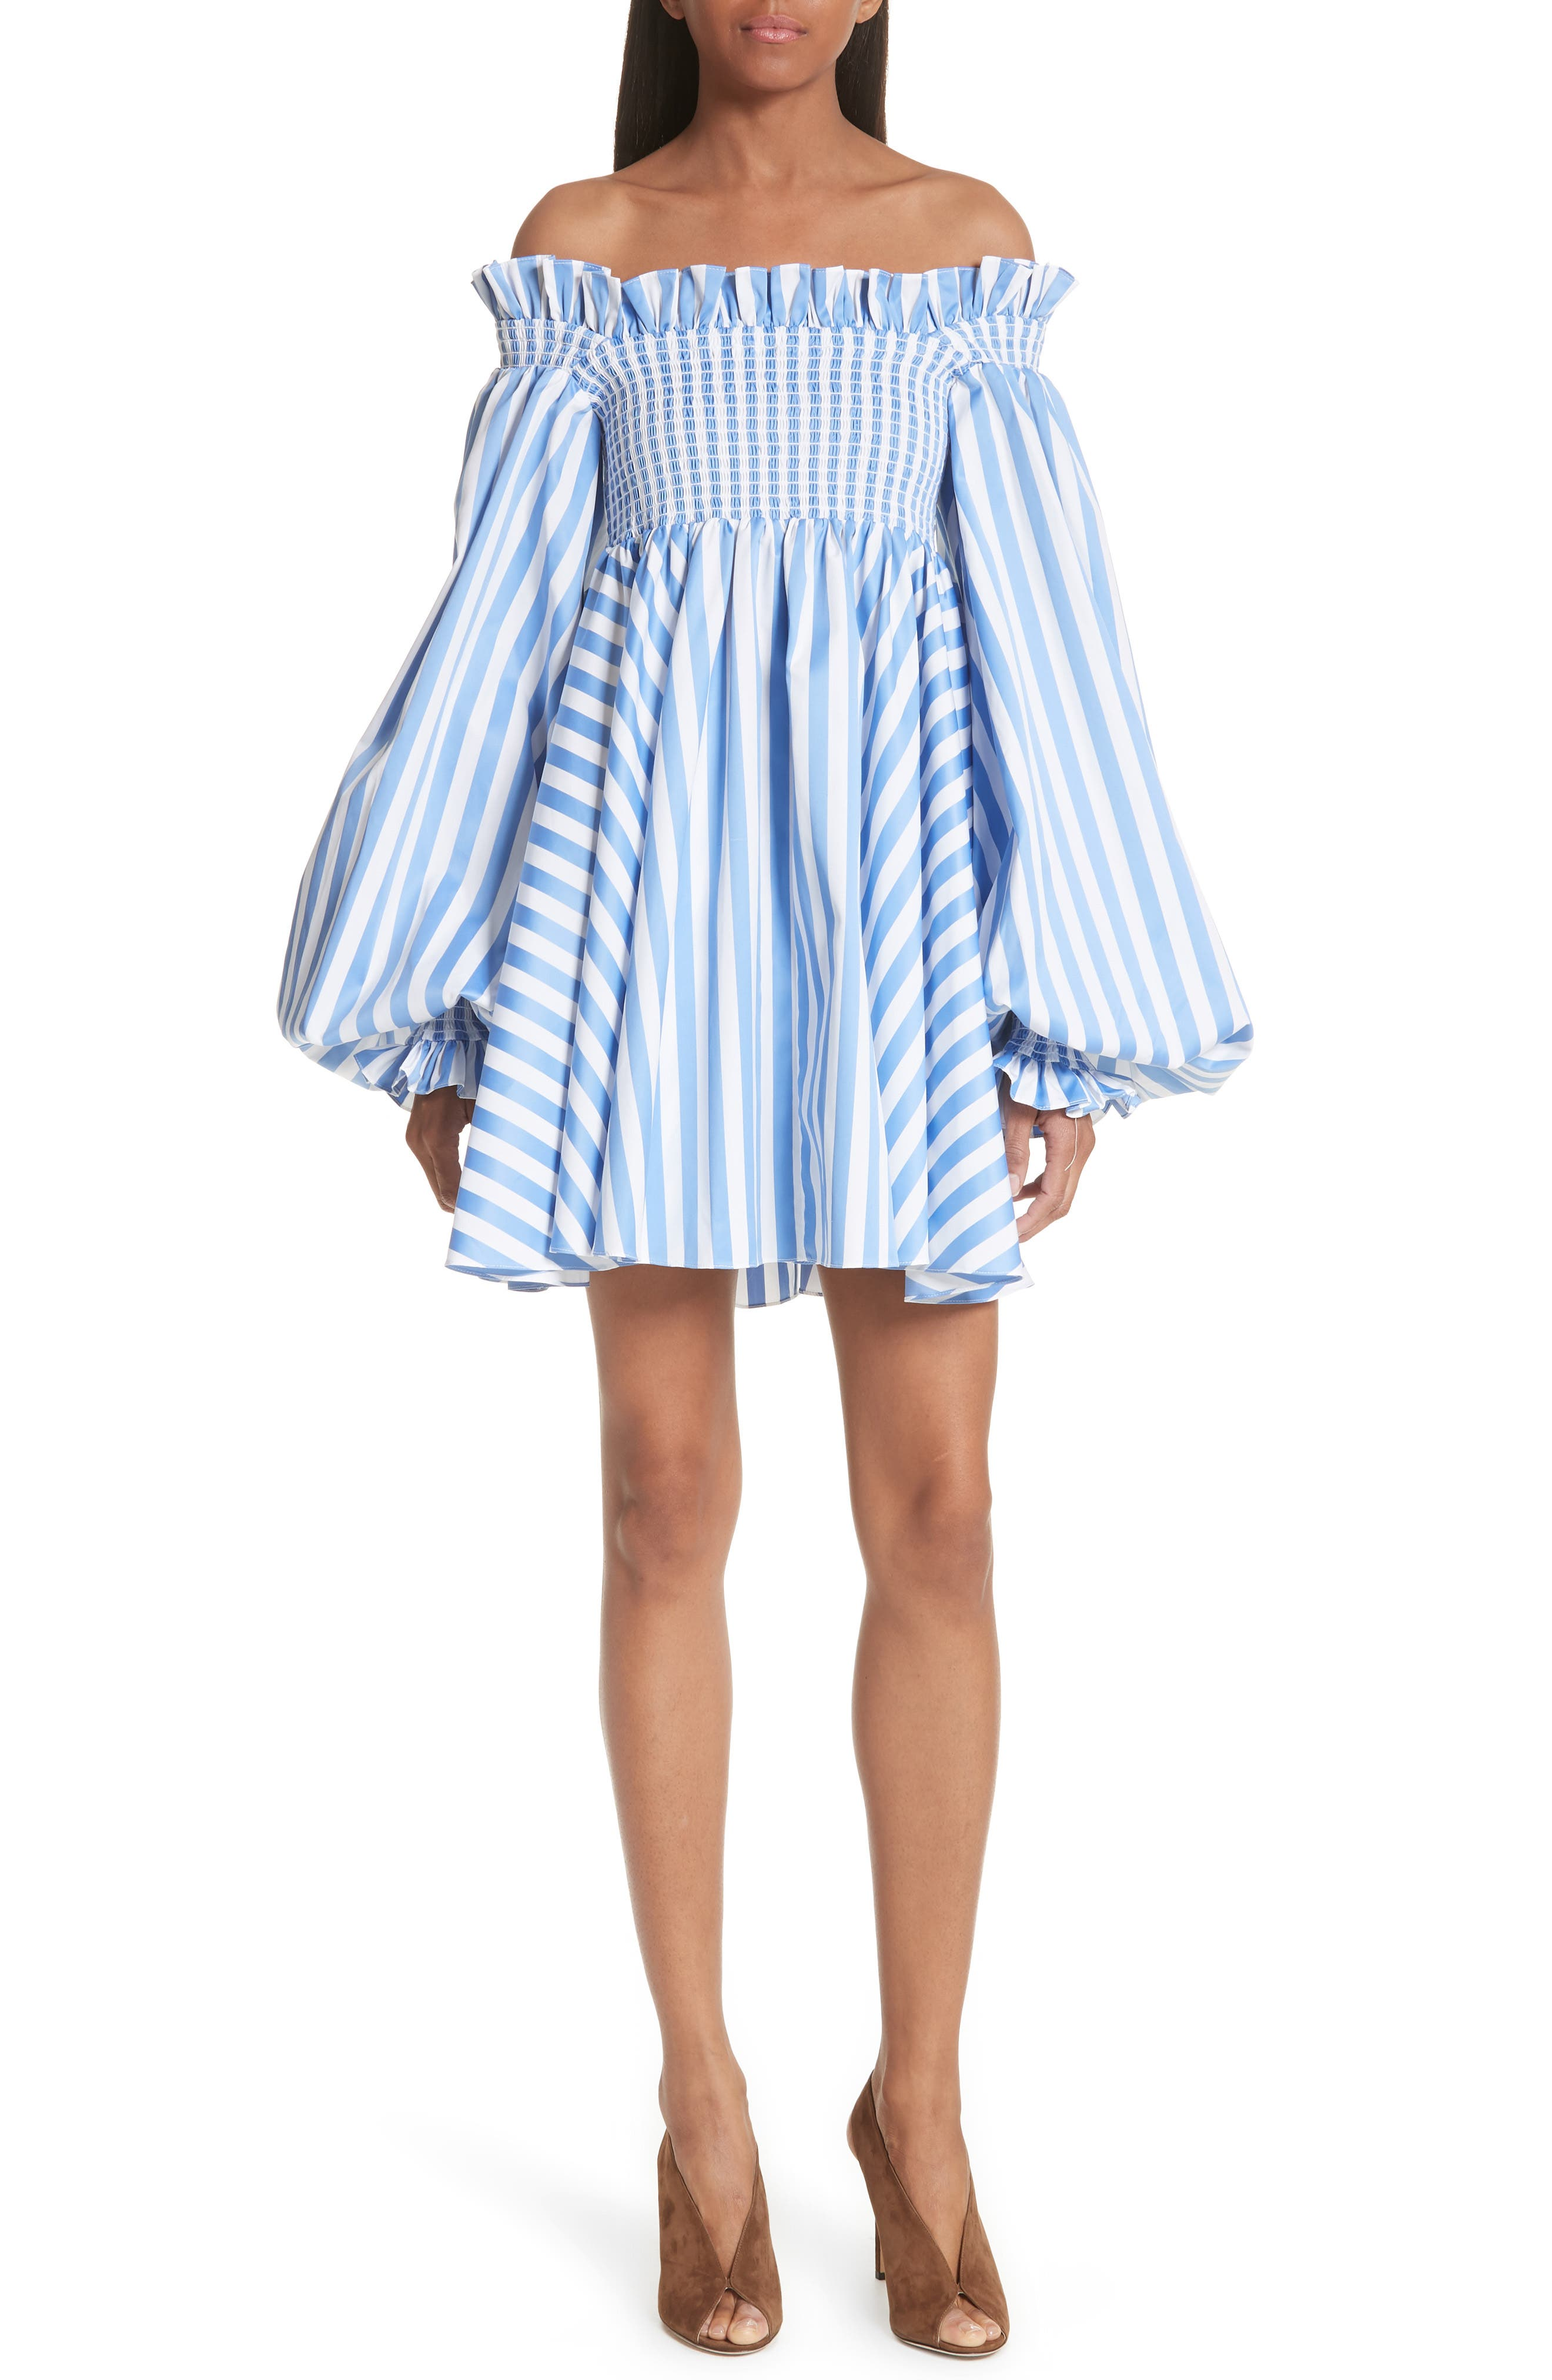 Kora Stripe Off the Shoulder Dress,                             Main thumbnail 1, color,                             434